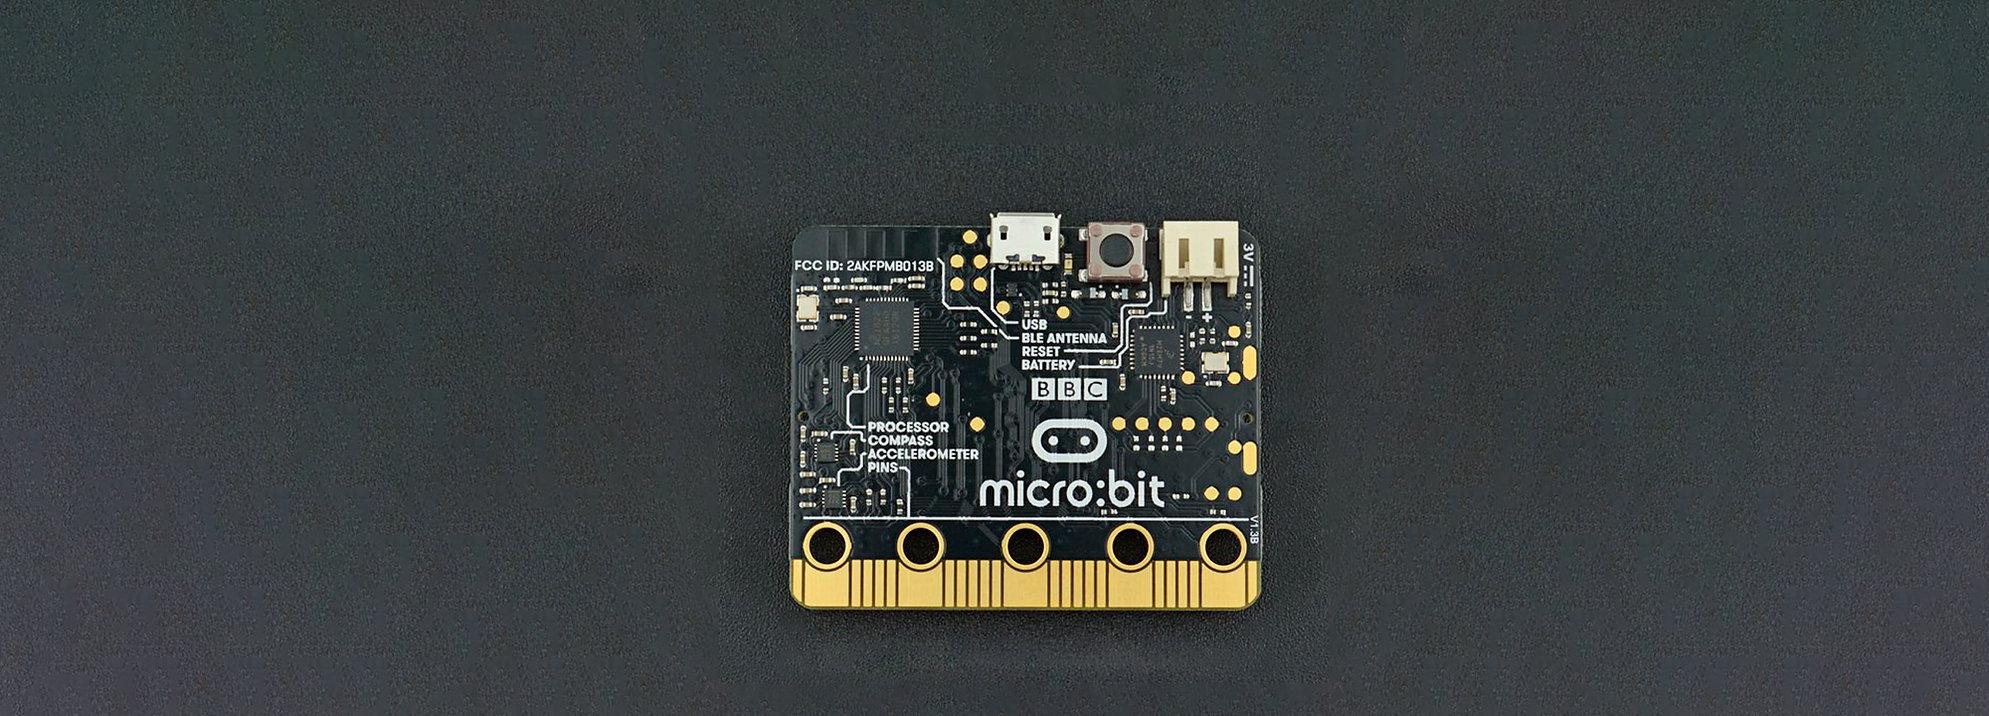 capa_microbit.jpg